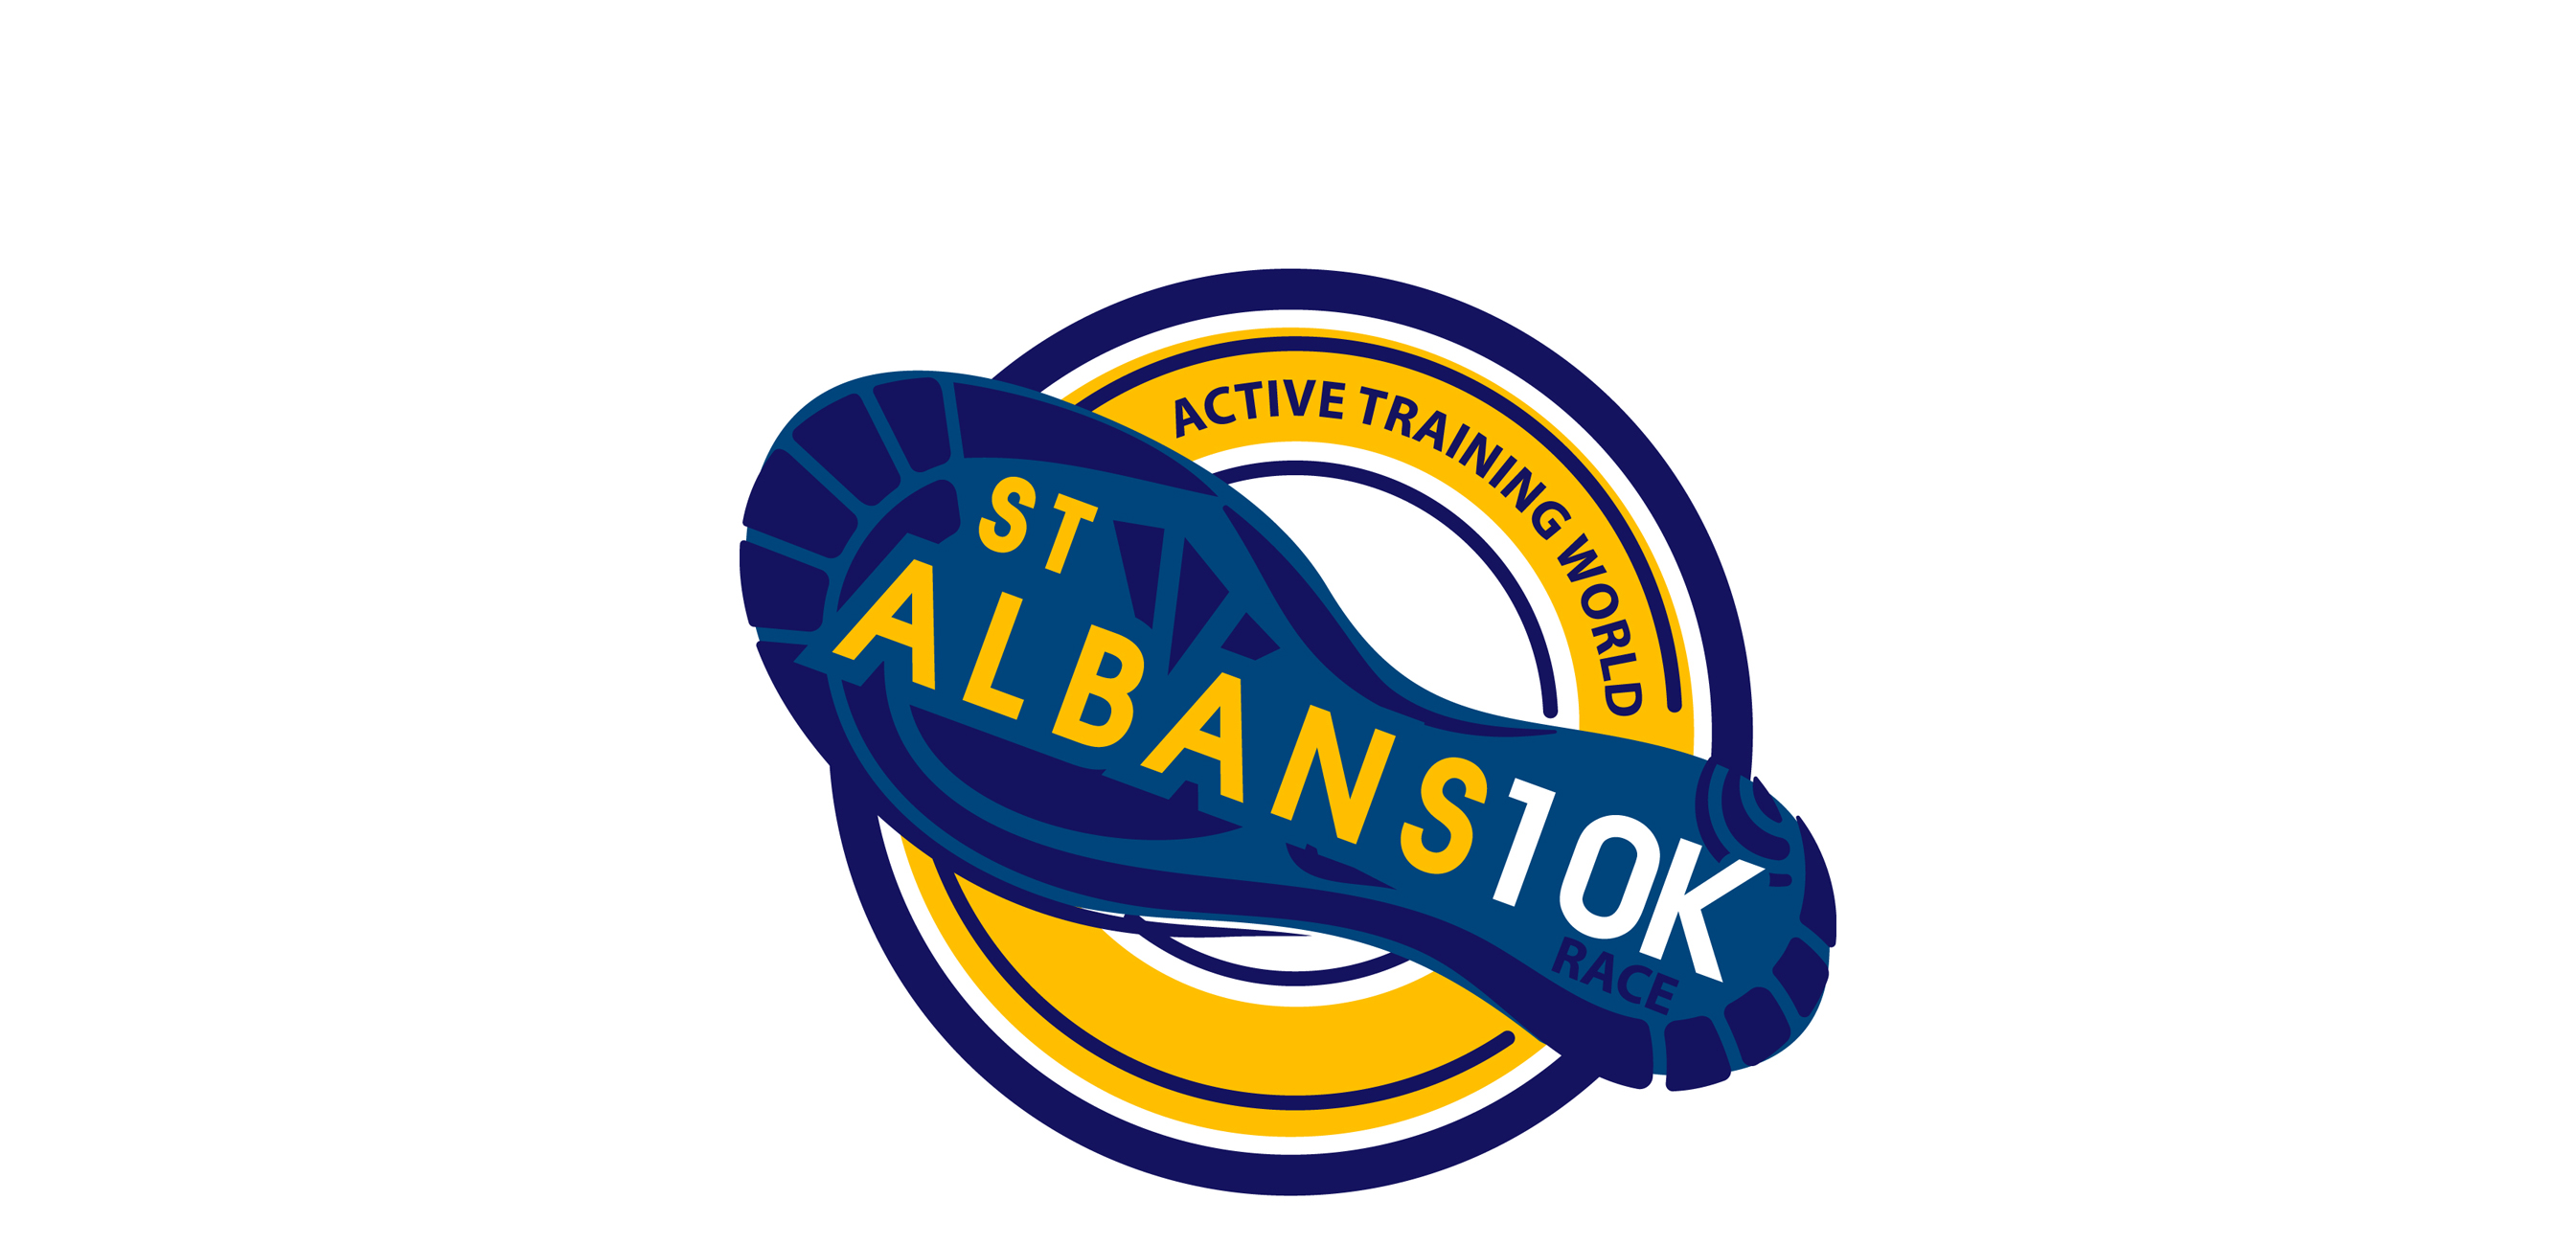 St Albans 10K \u002D April - cover image